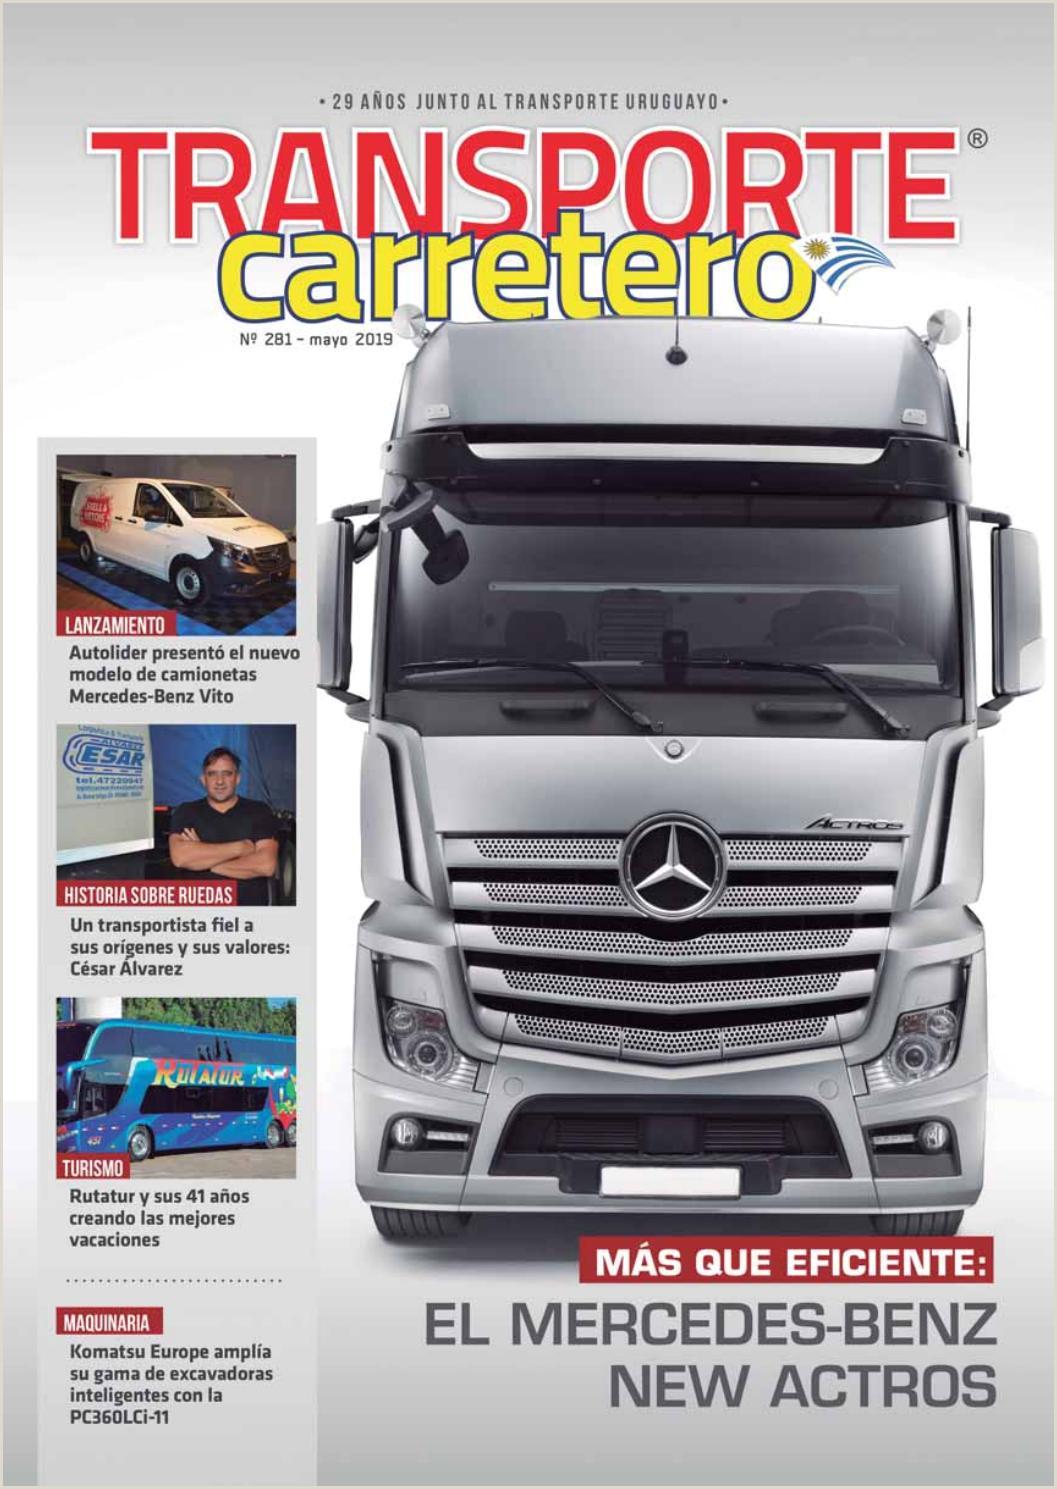 Transporte Carretero Nº 281 Mayo 2019 by Dise±o Producciones